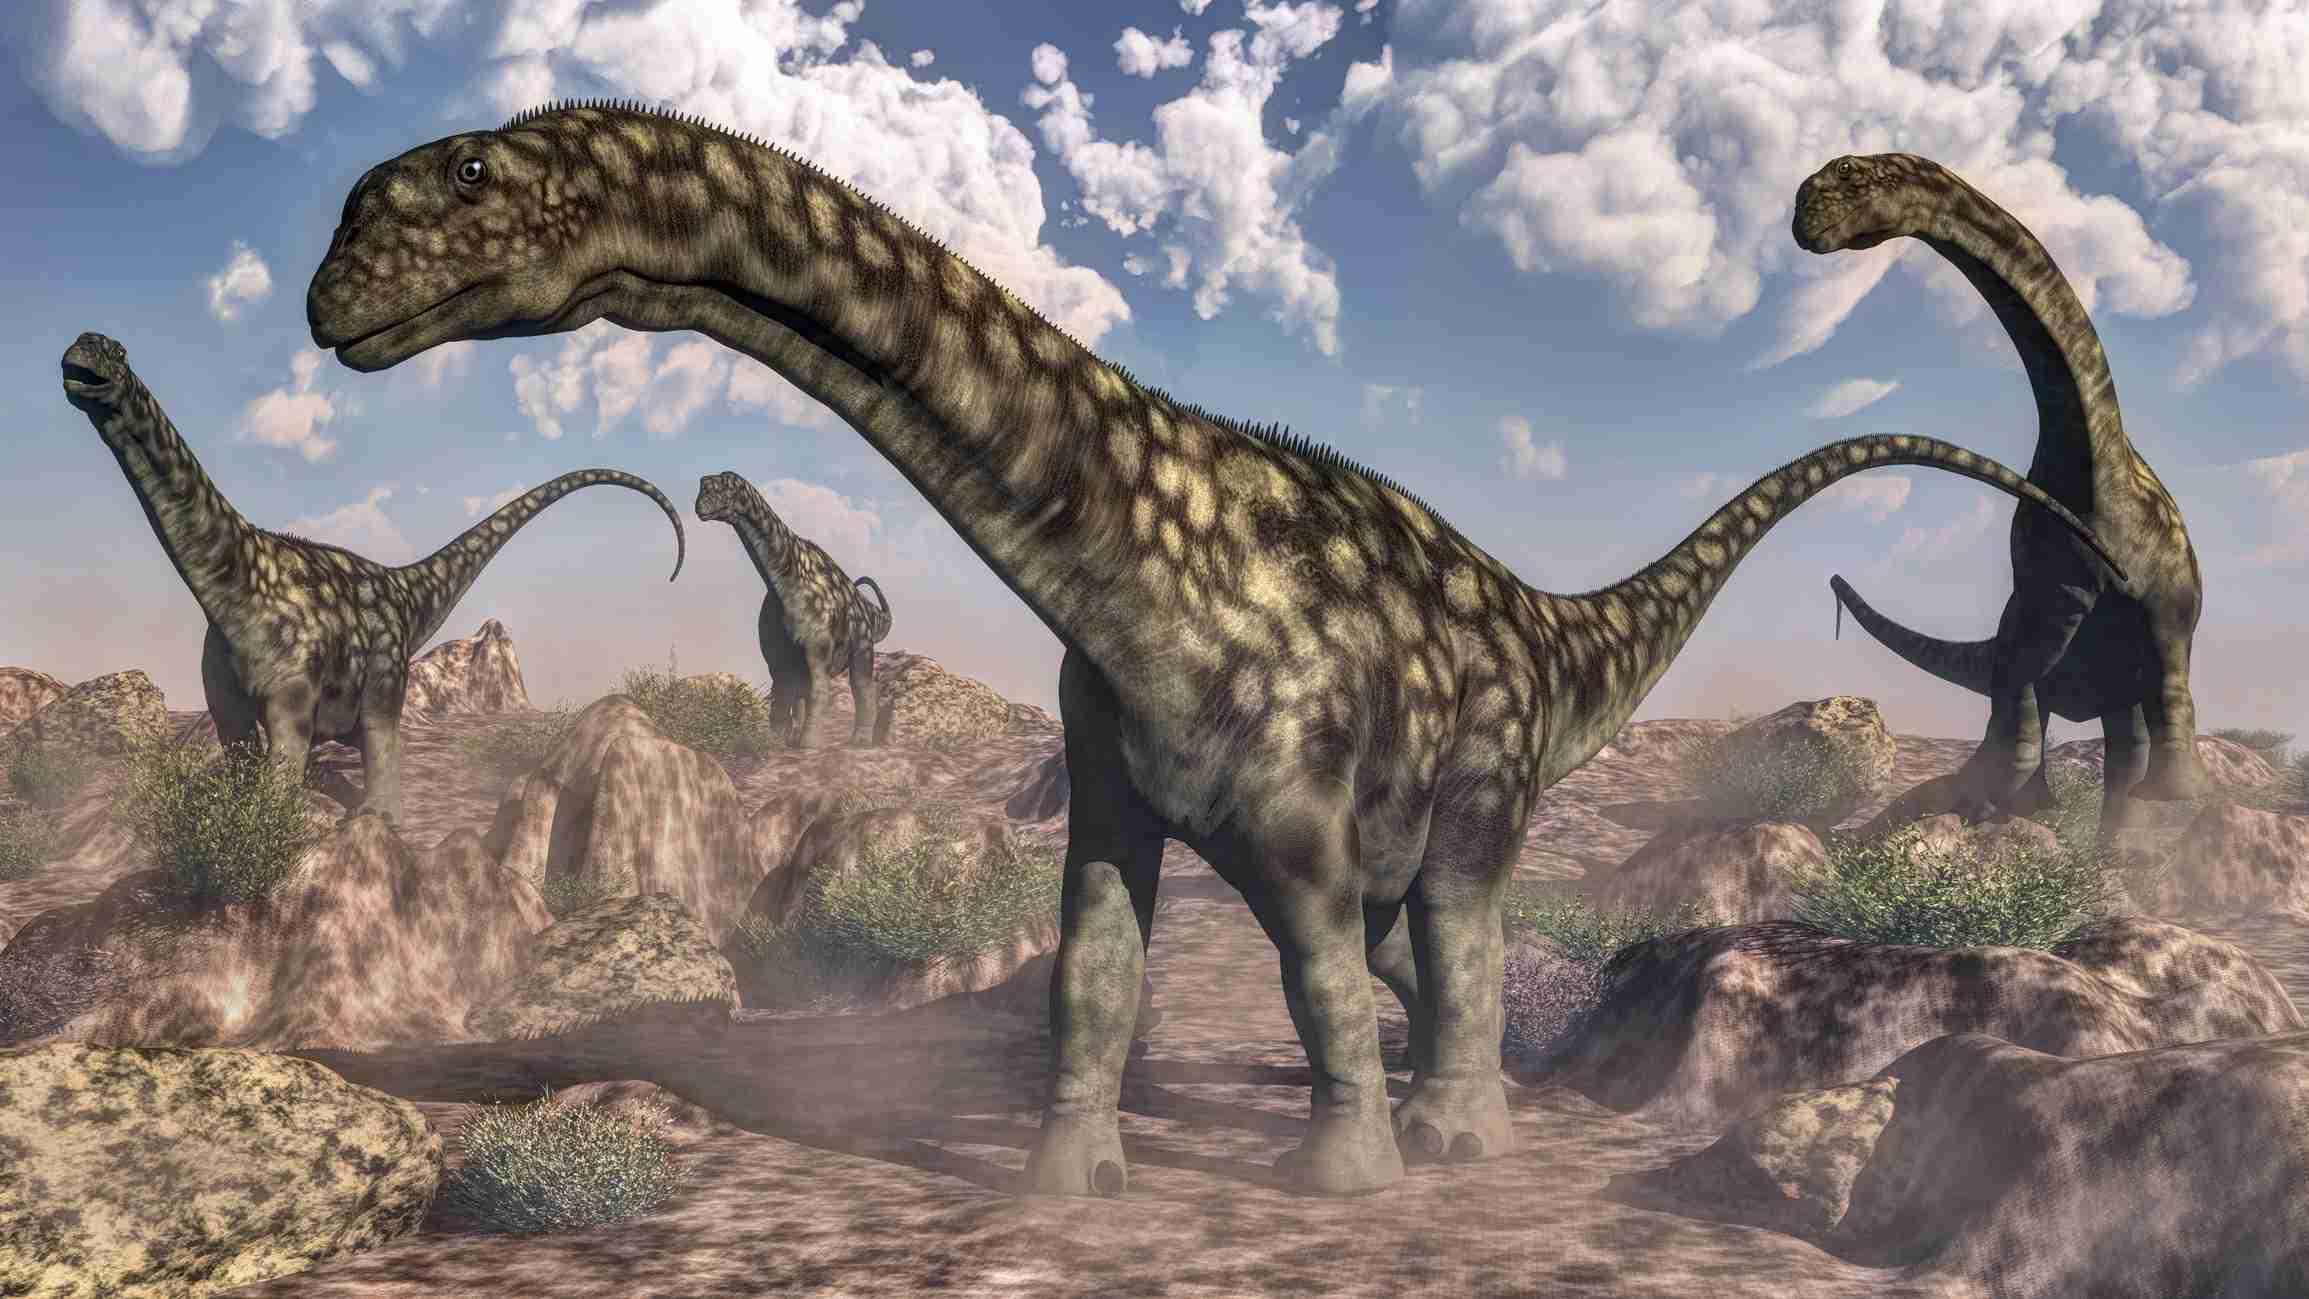 South American dinosaurs